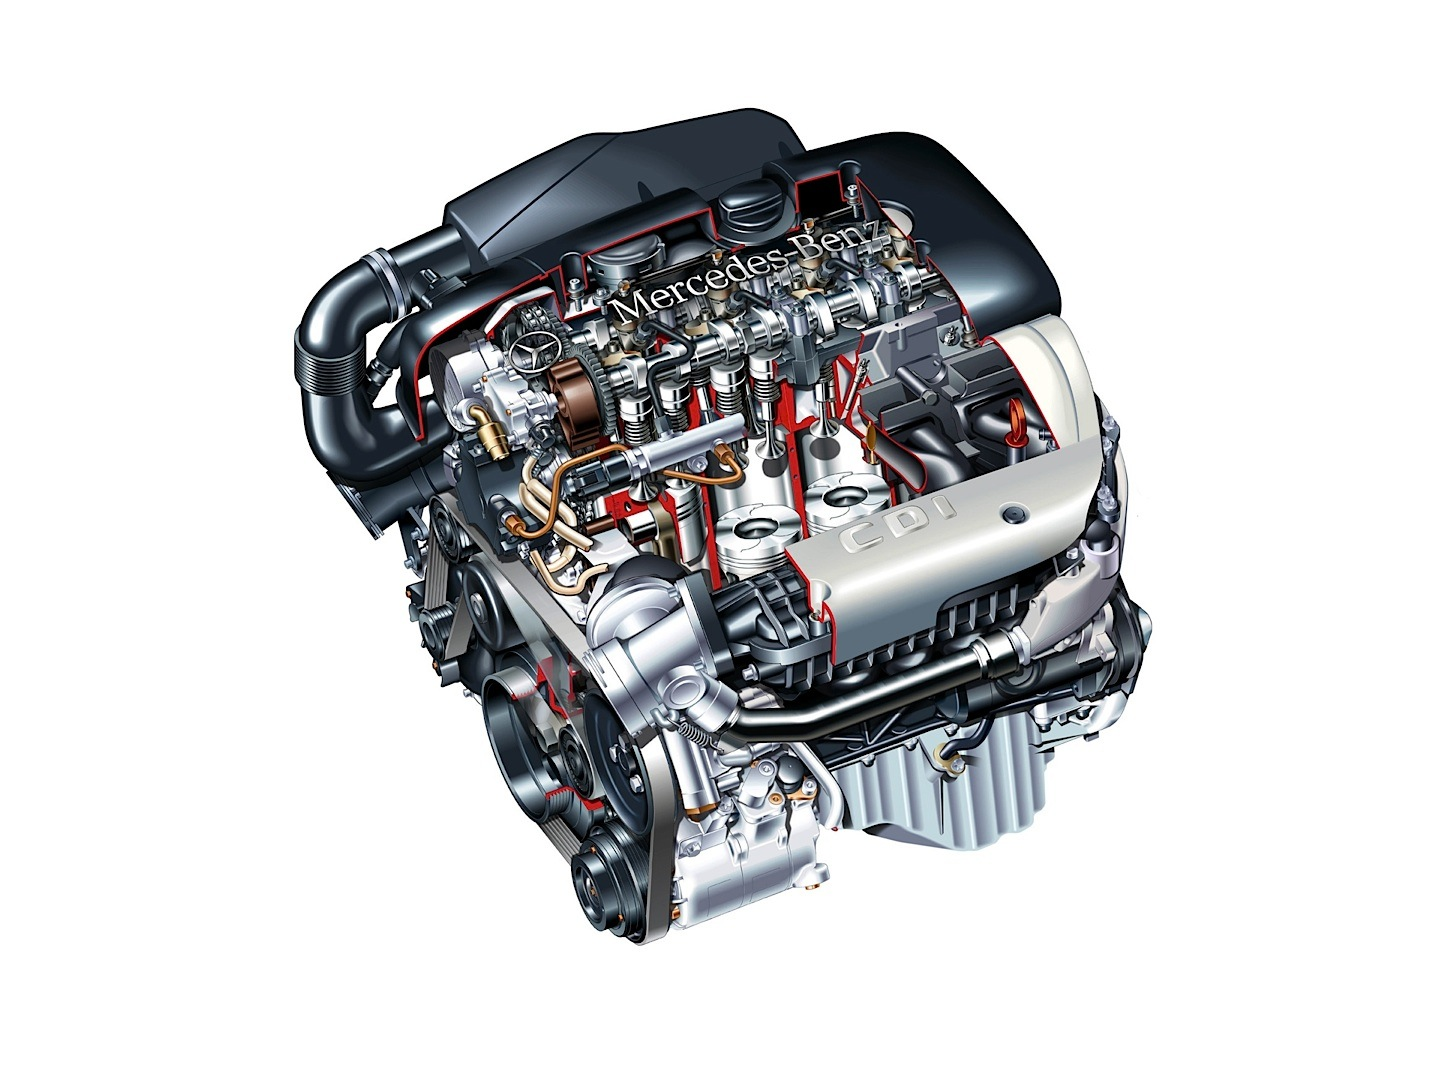 Mercedes Benz C Class Powertrain Milestones Autoevolution